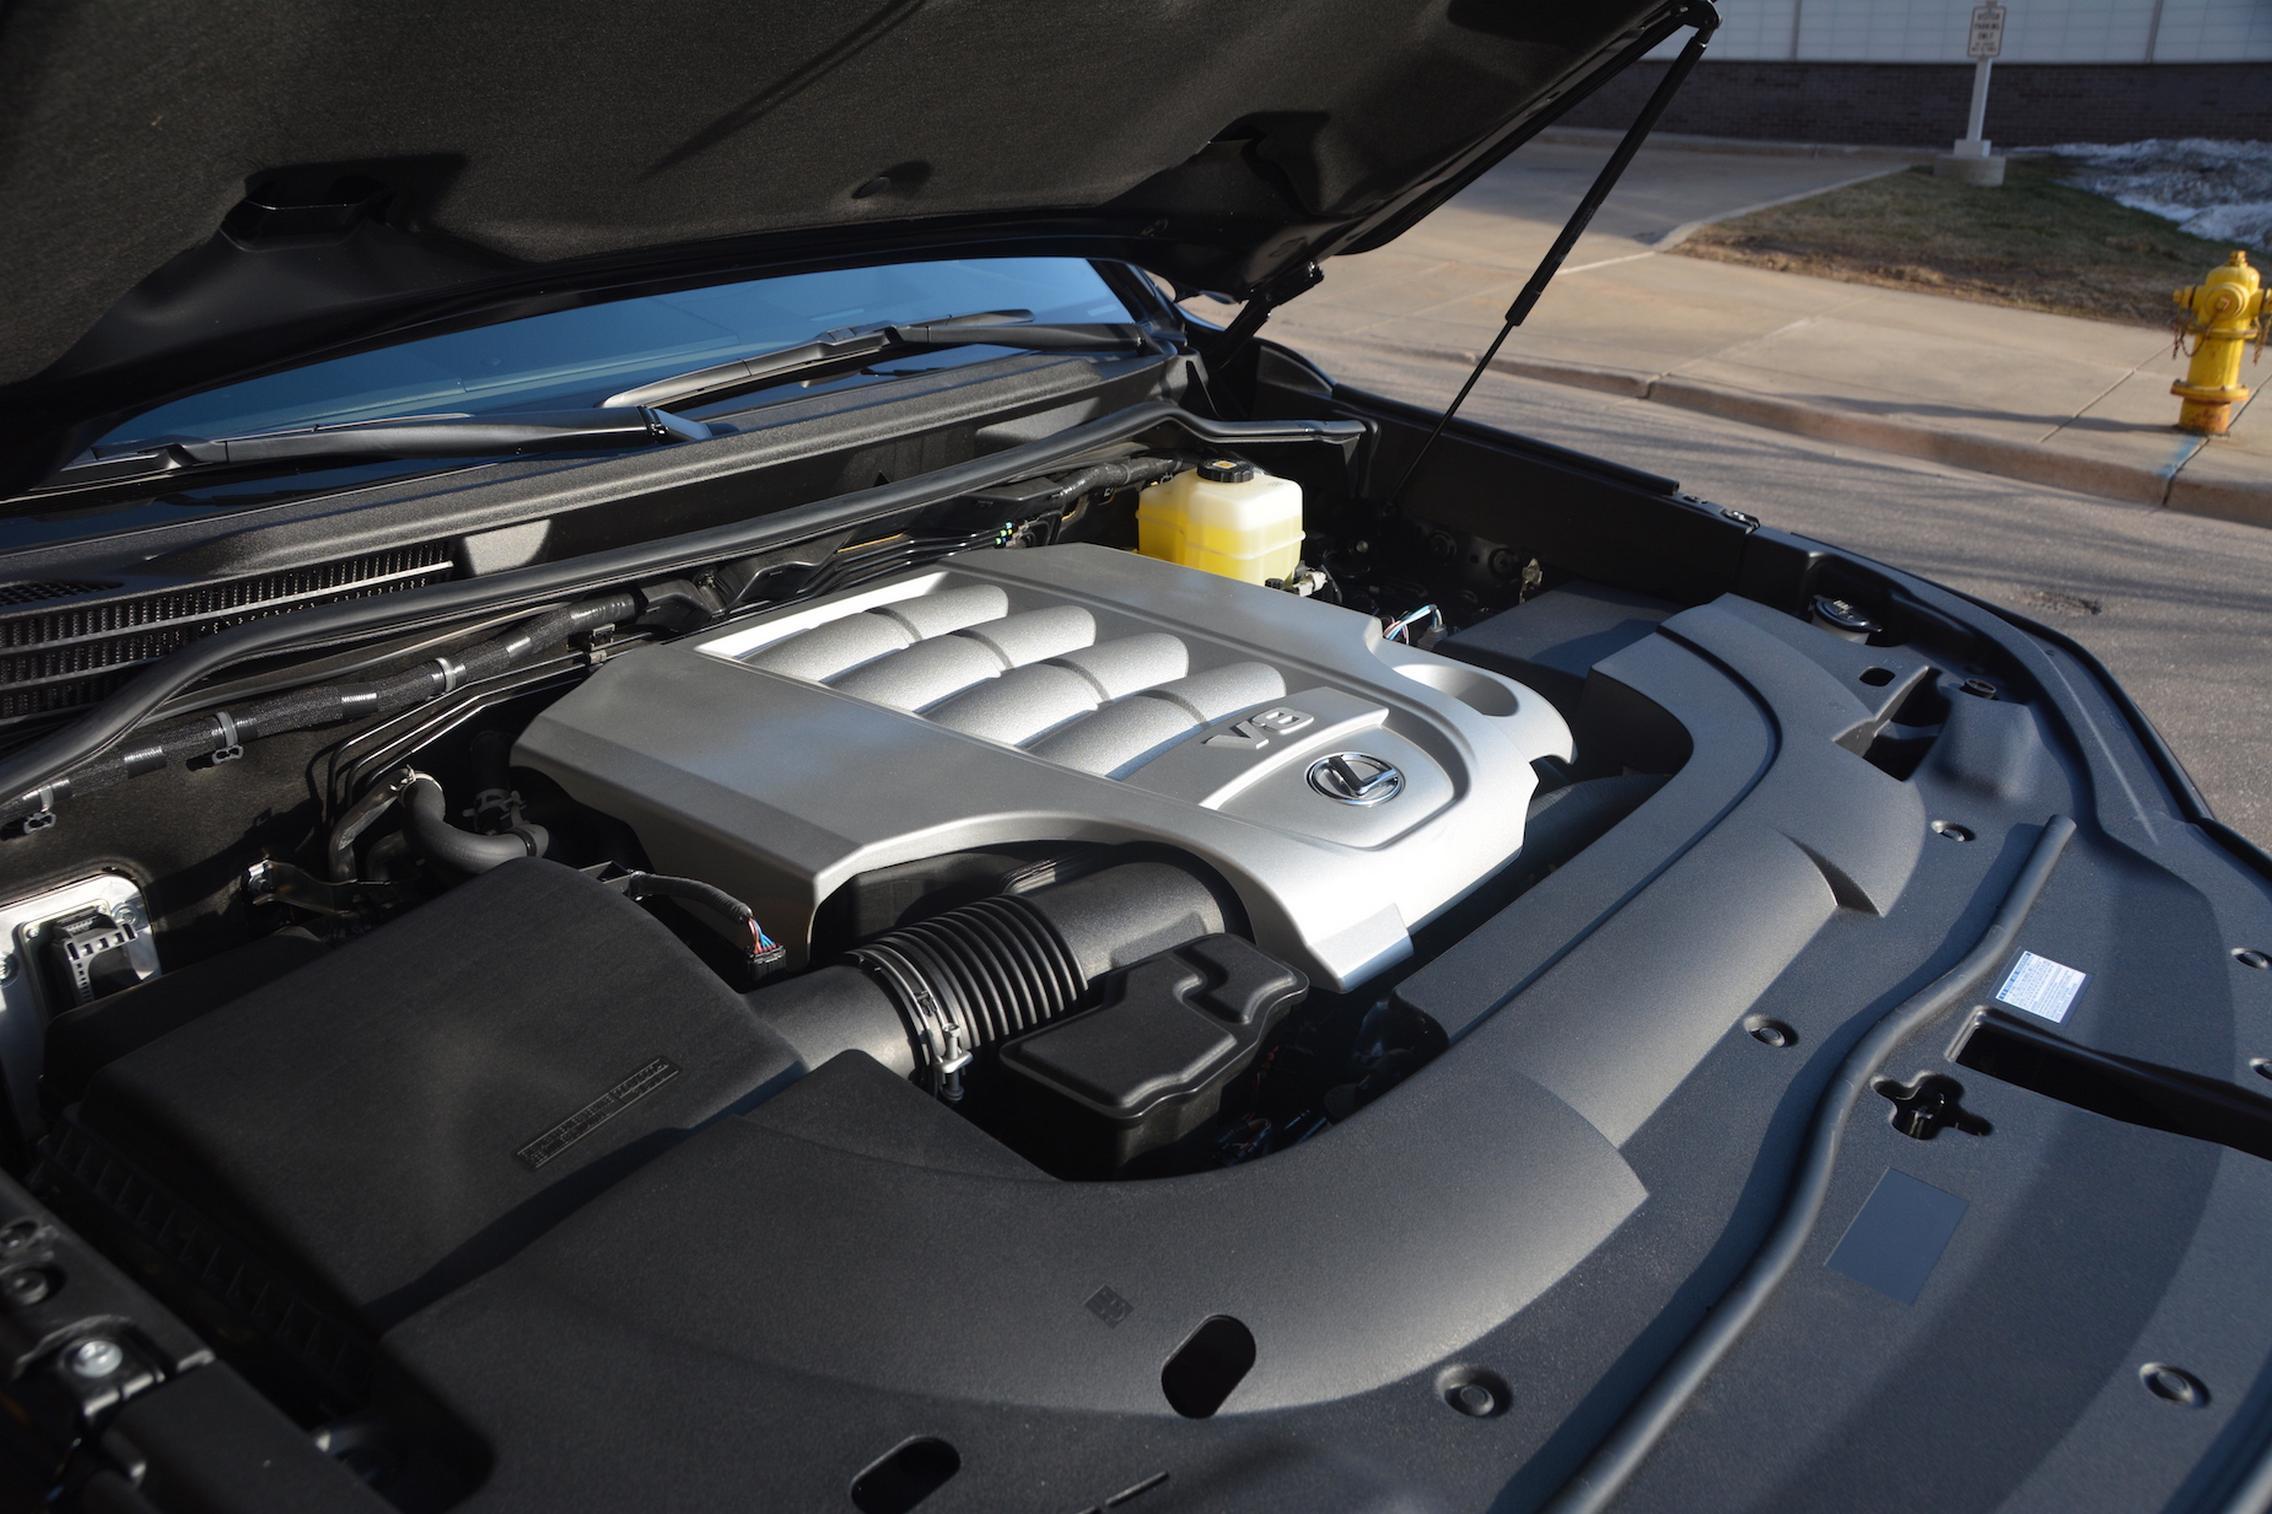 2021 Lexus LX570 engine